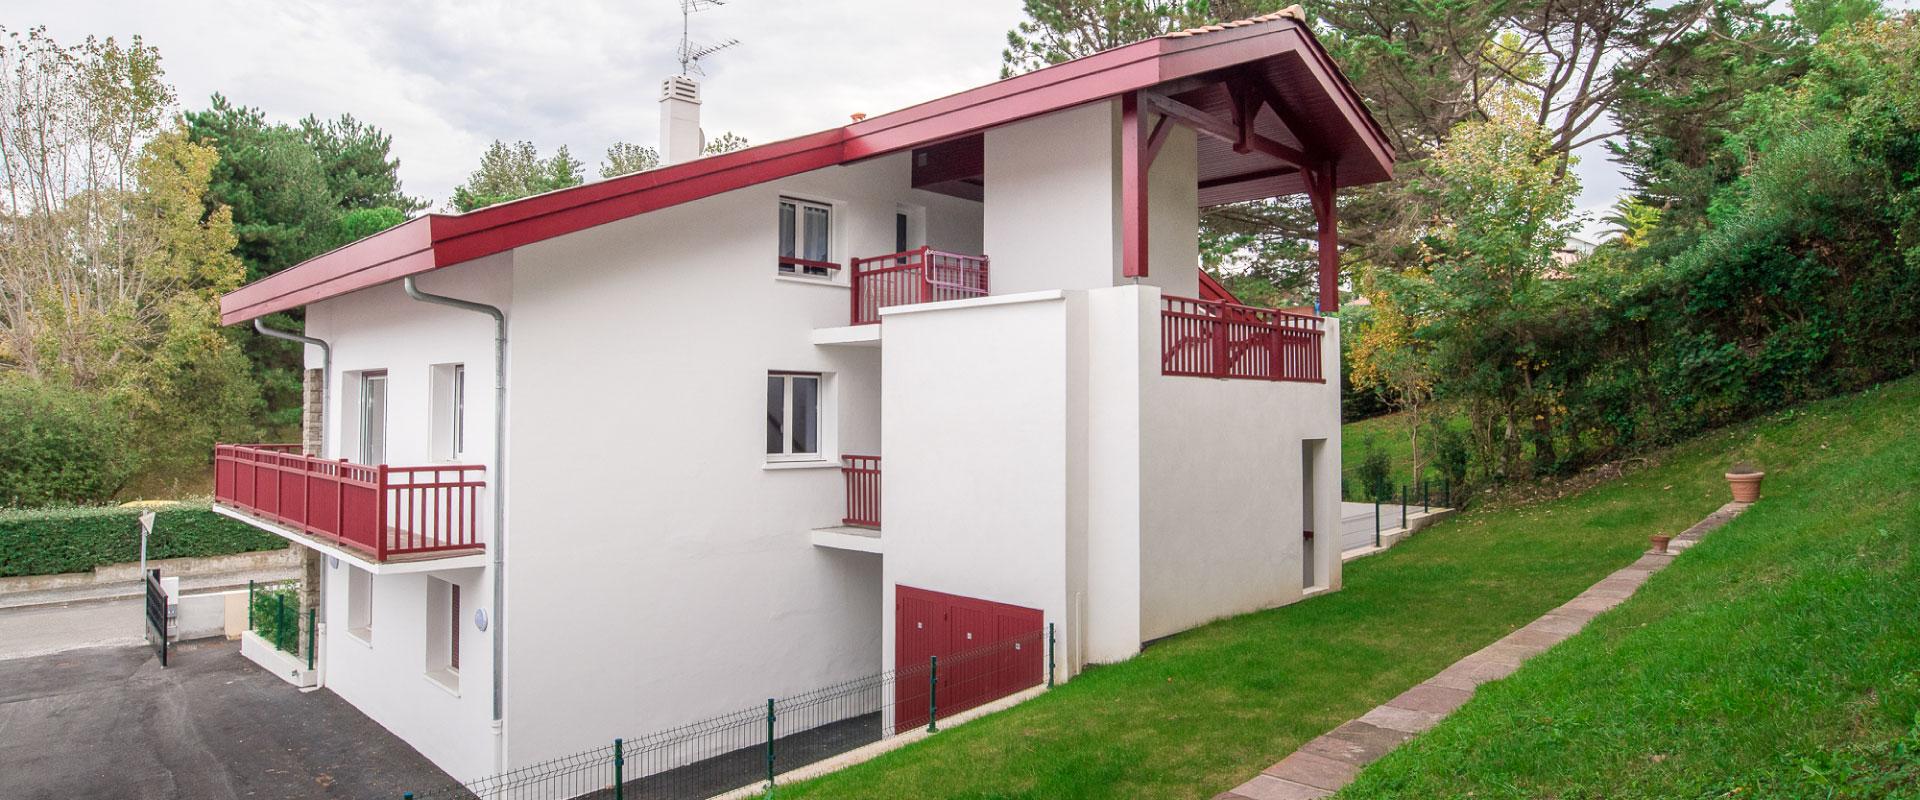 zubieta-constructions-renovation-batiment-guetary